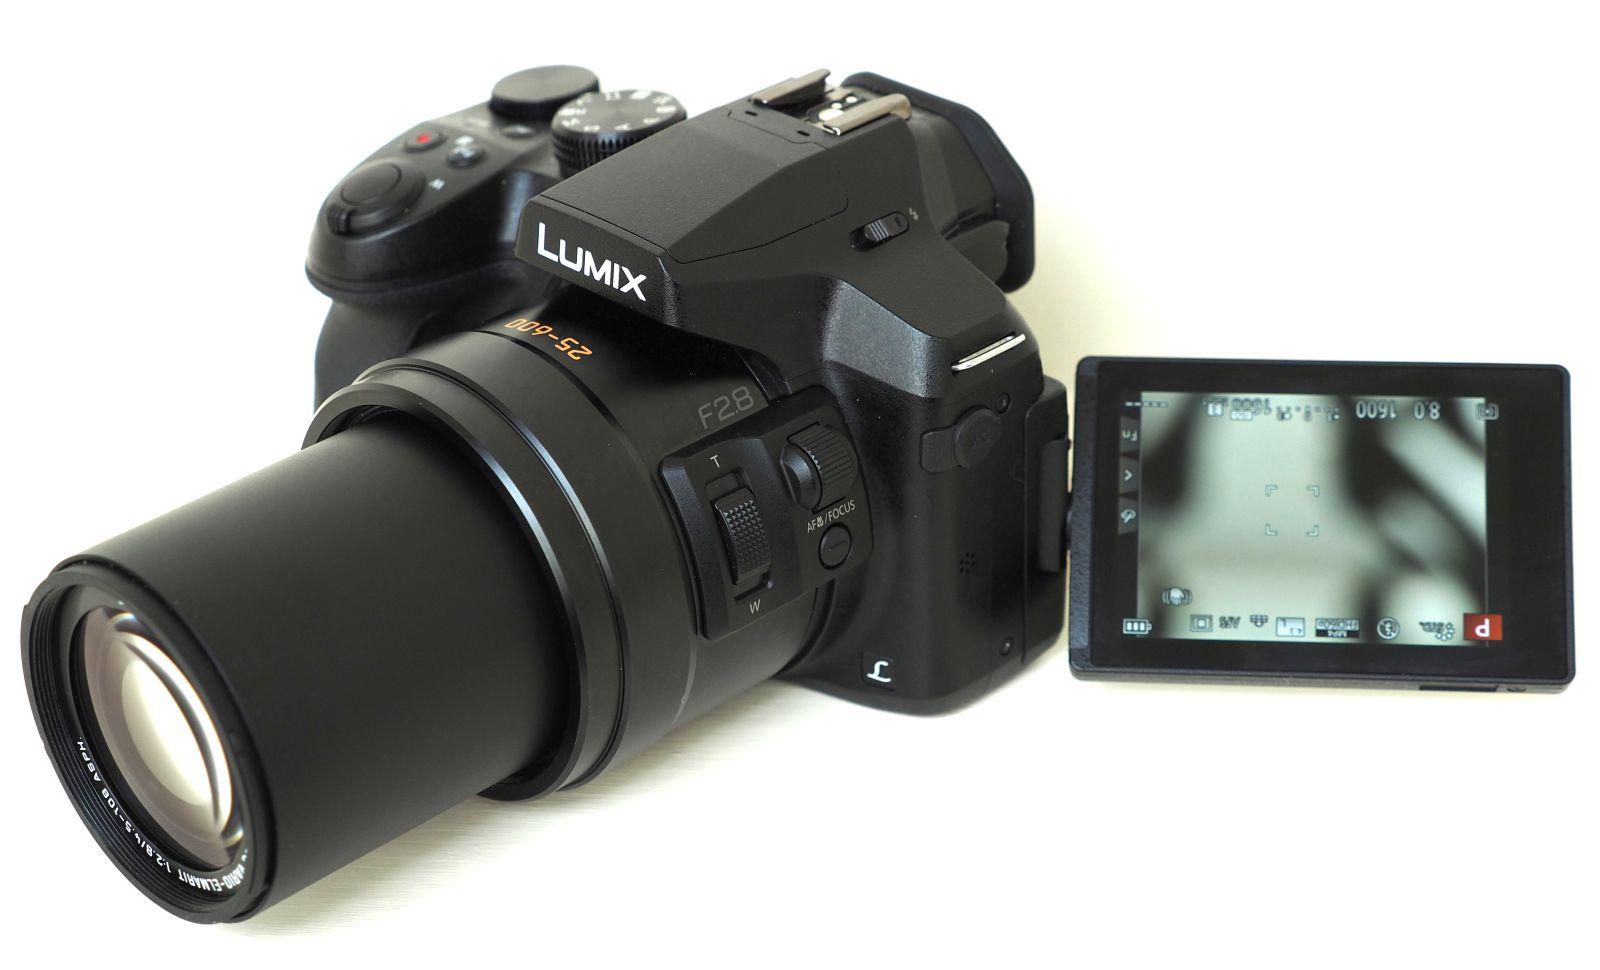 Download Panasonic lumix g5 firmware hack